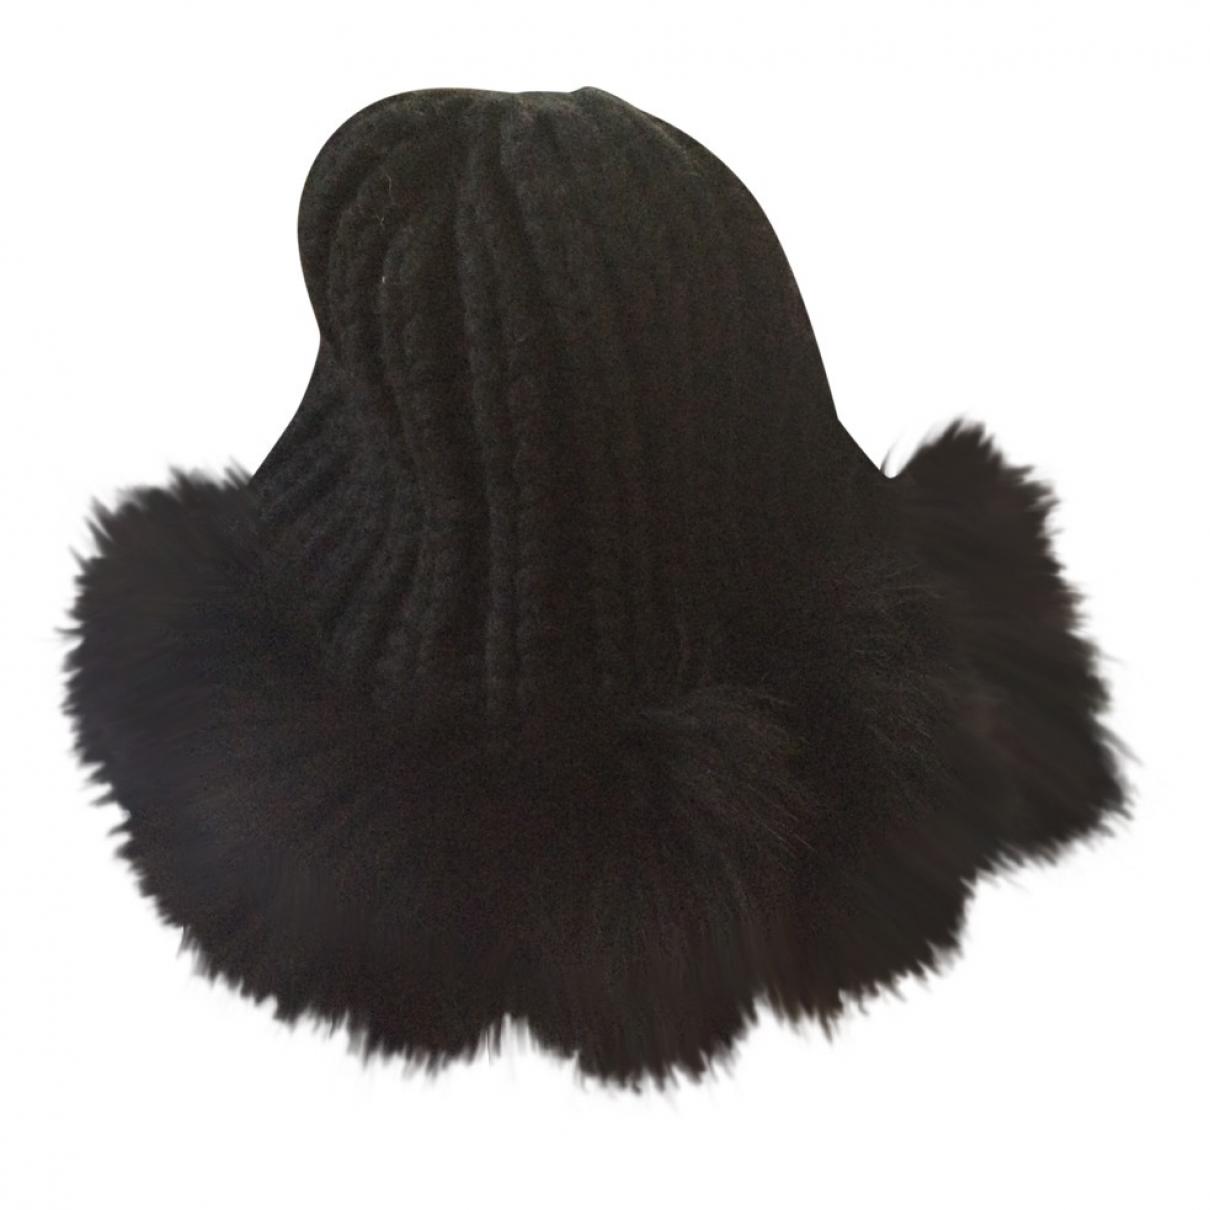 Dior \N Black Wool hat for Women L International